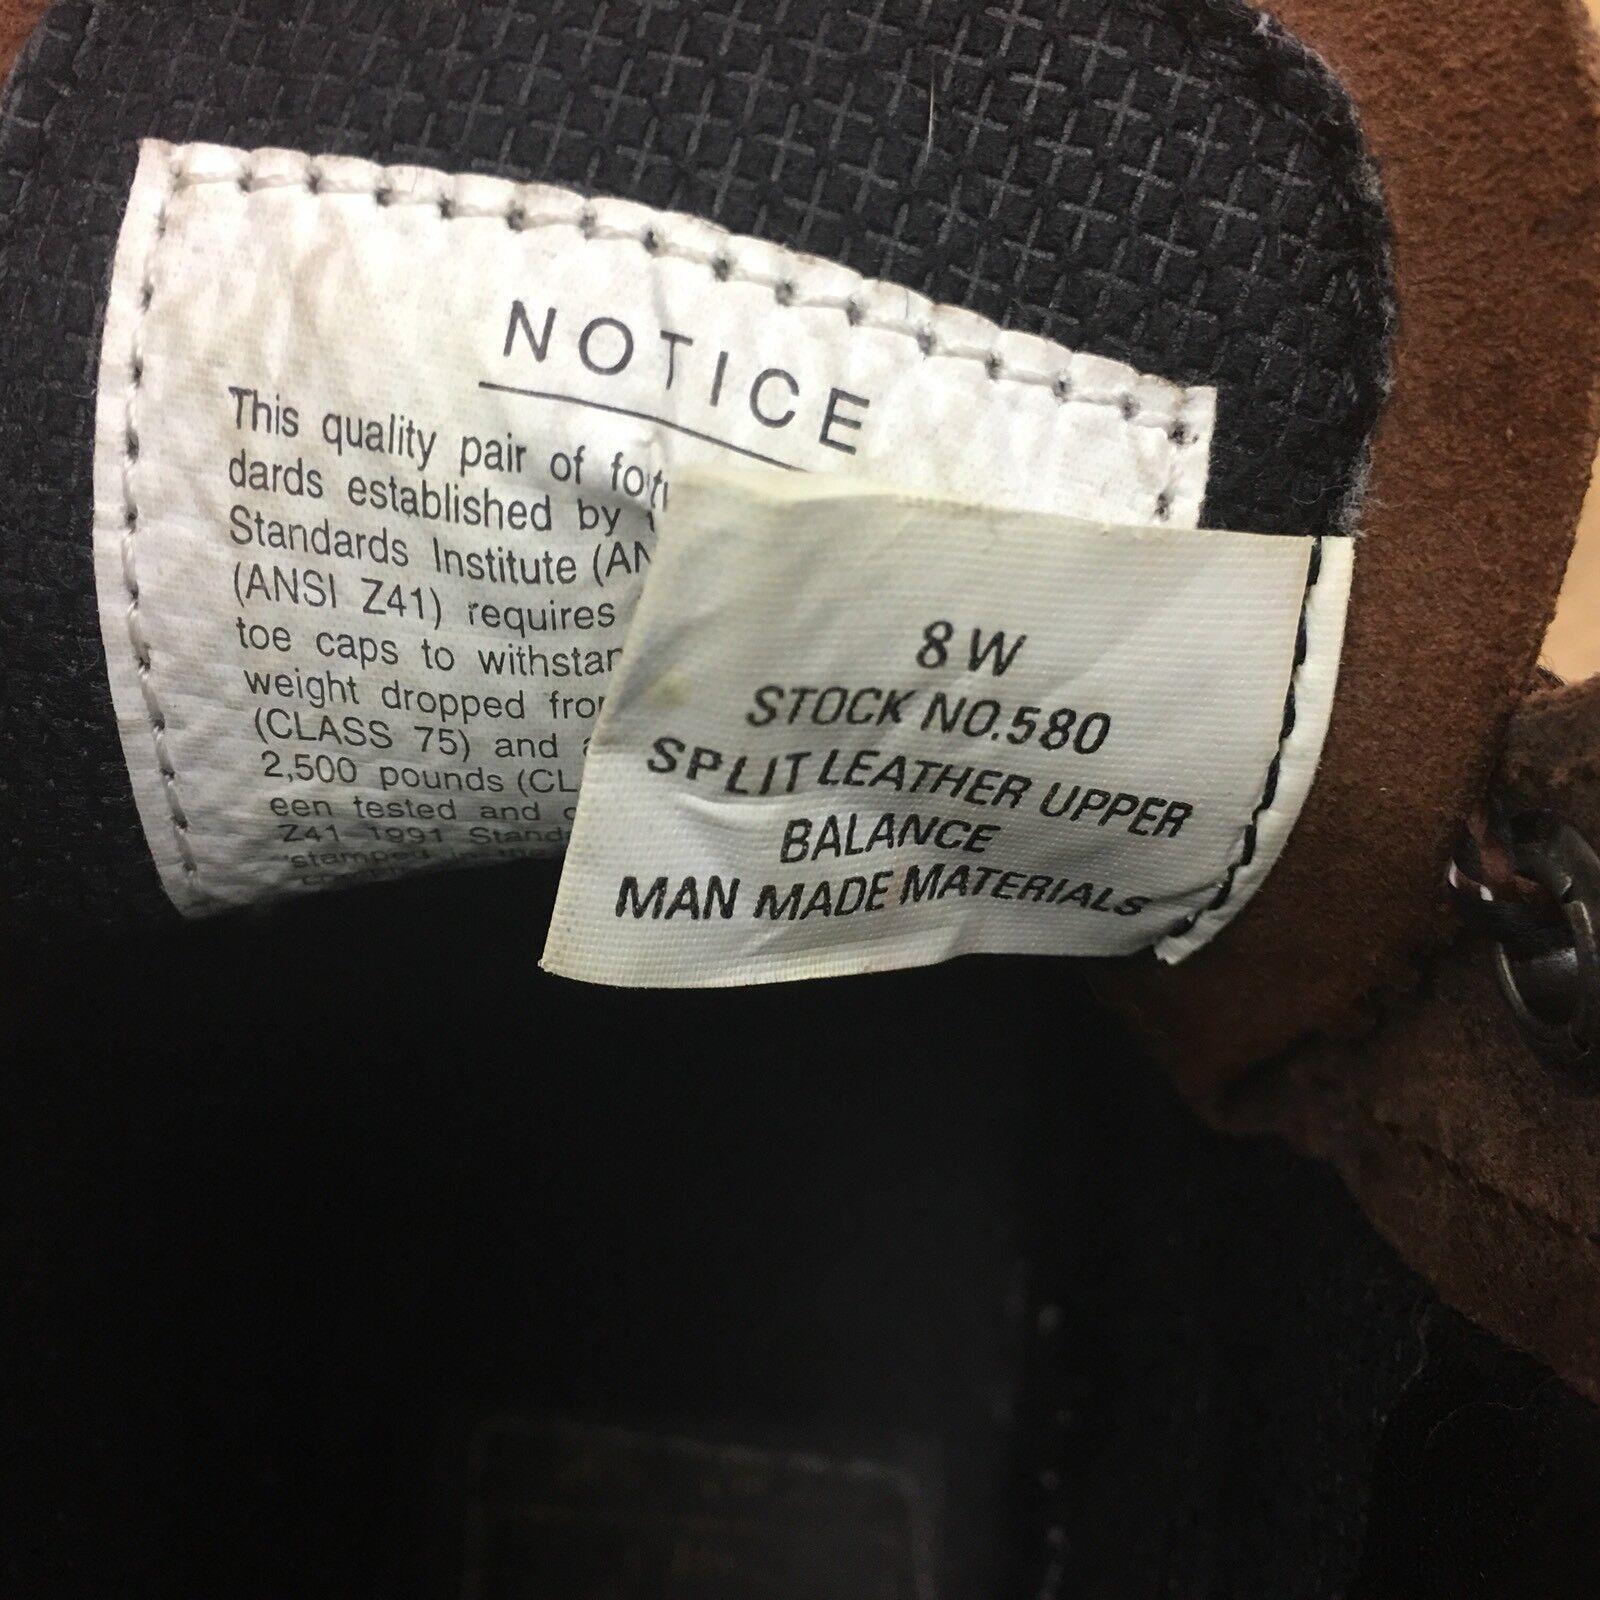 LeHigh Stiefel damen's 8W Ansi Ansi Ansi Z41 Oil Resistant braun Leather Safety Stiefel  SB08 a732f8